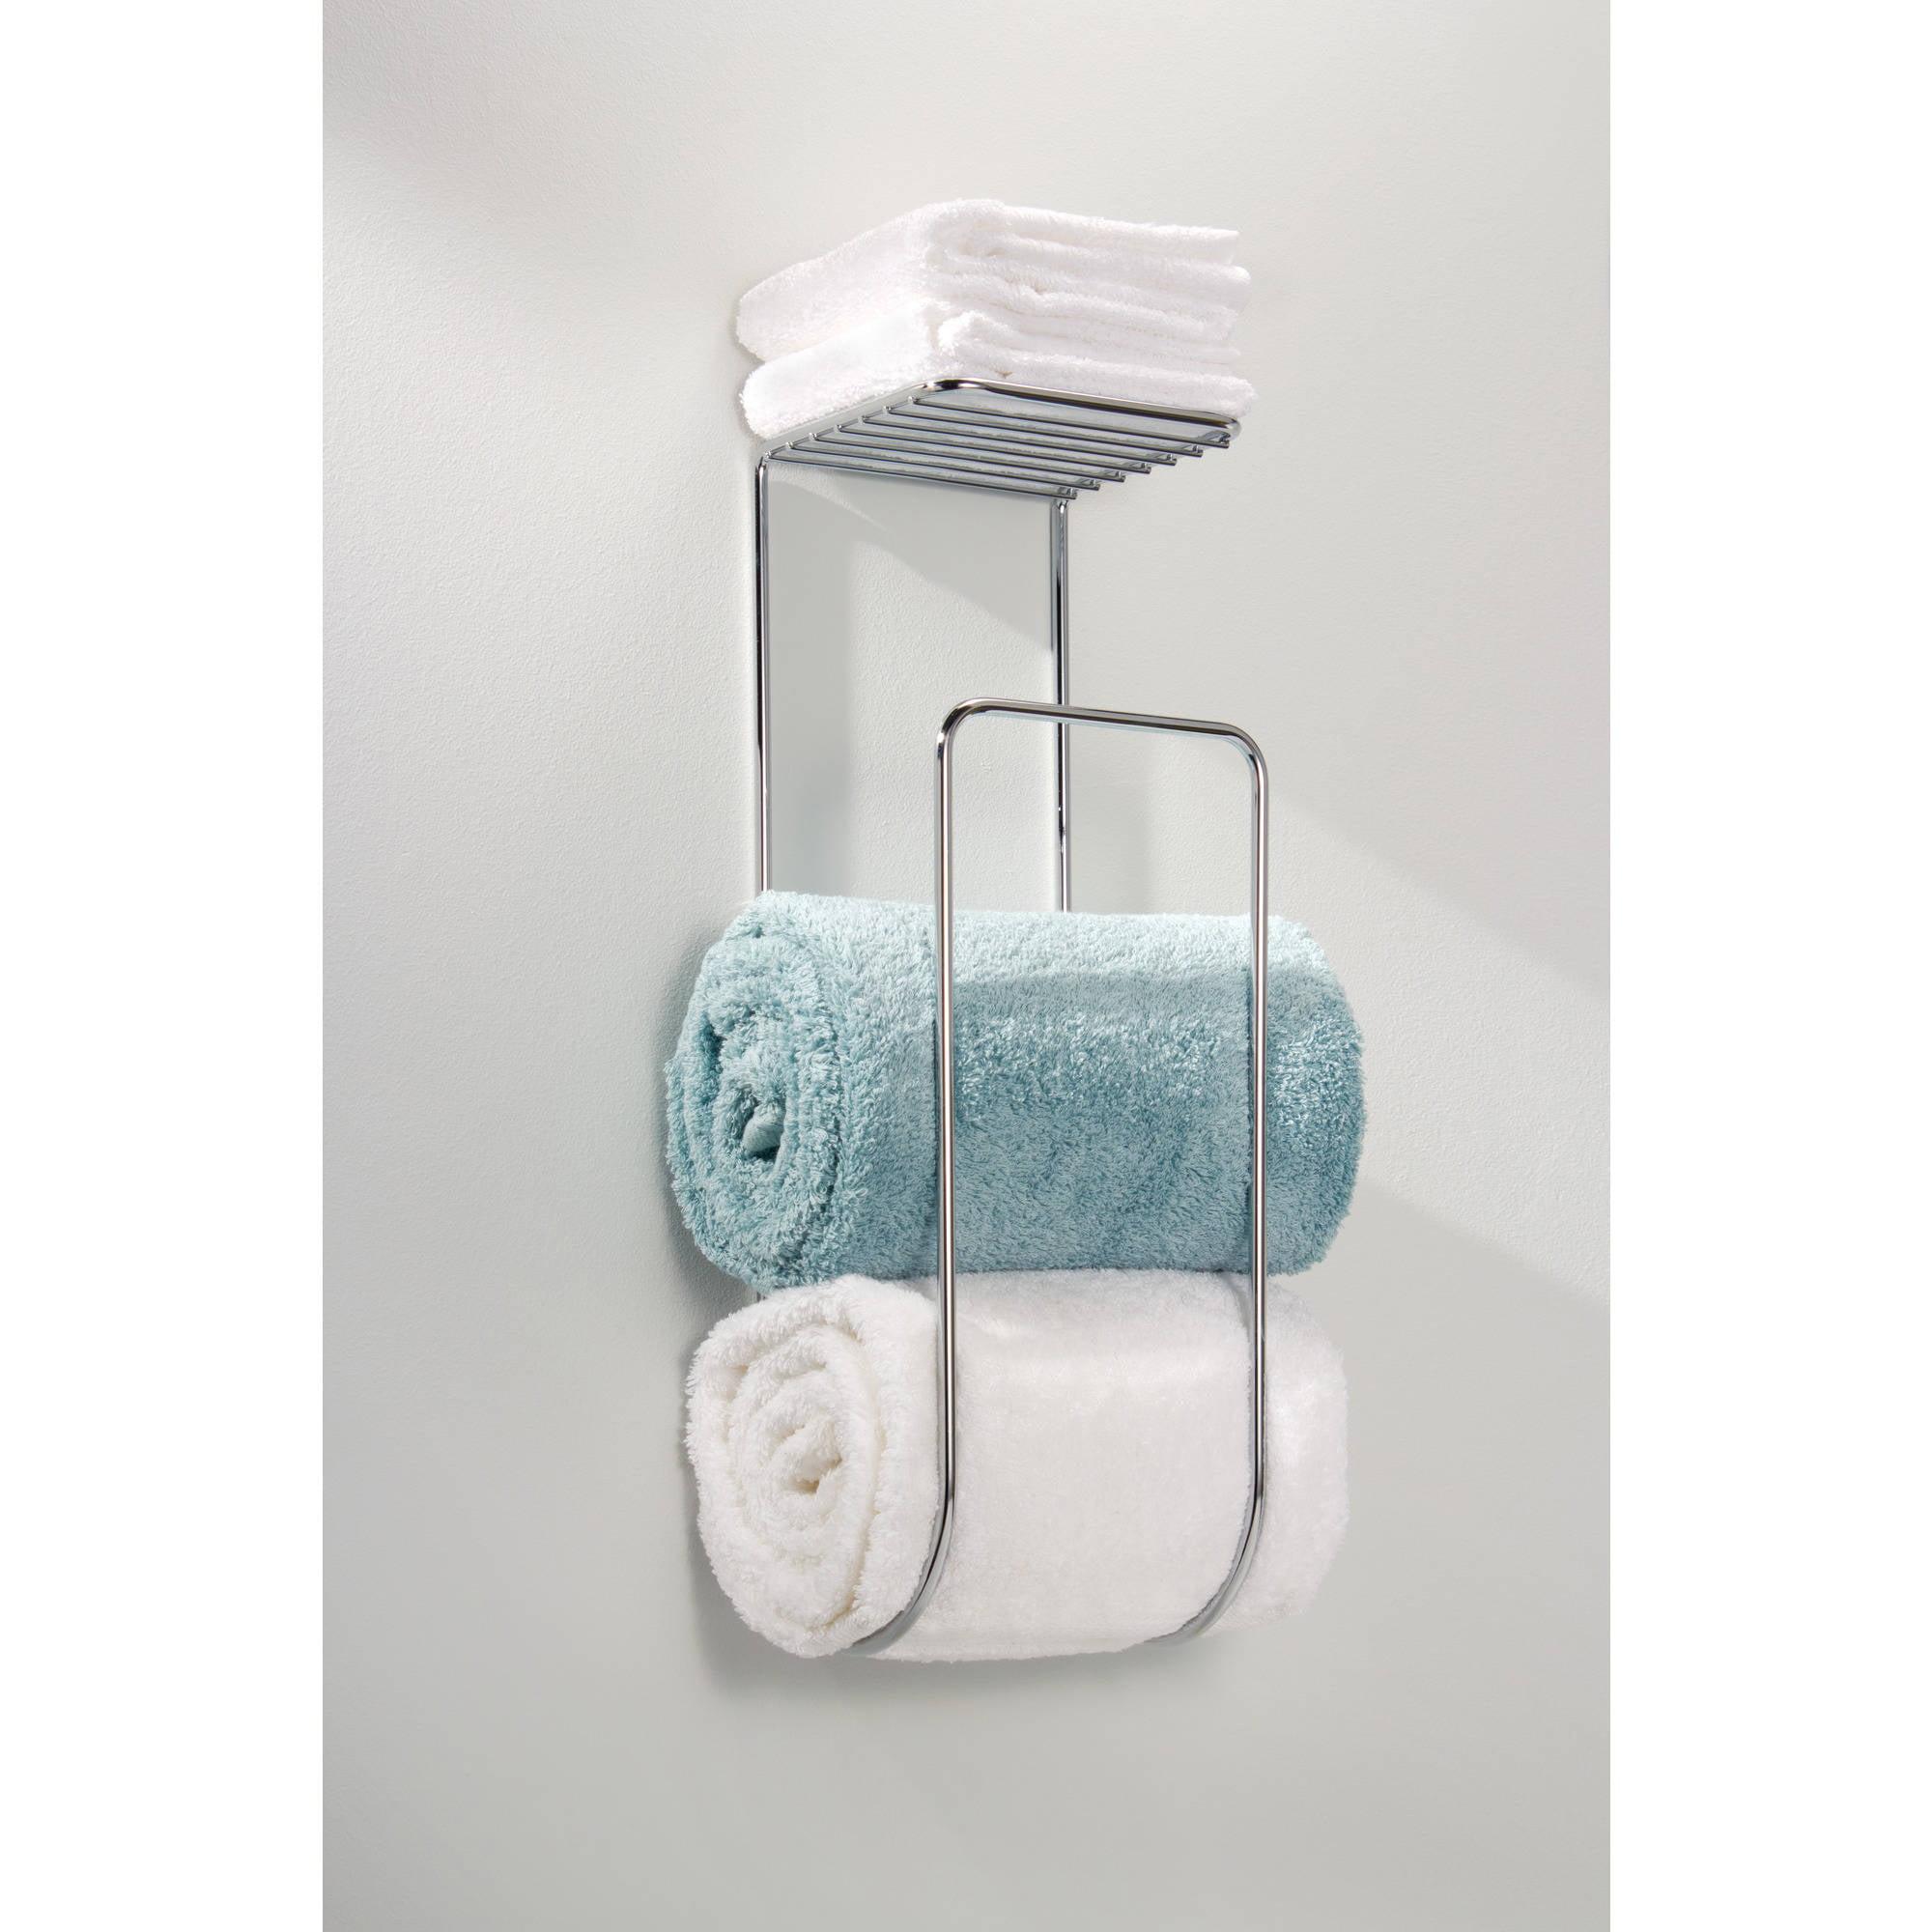 InterDesign Classico Wall Mount Towel Holder, Chrome - Walmart.com